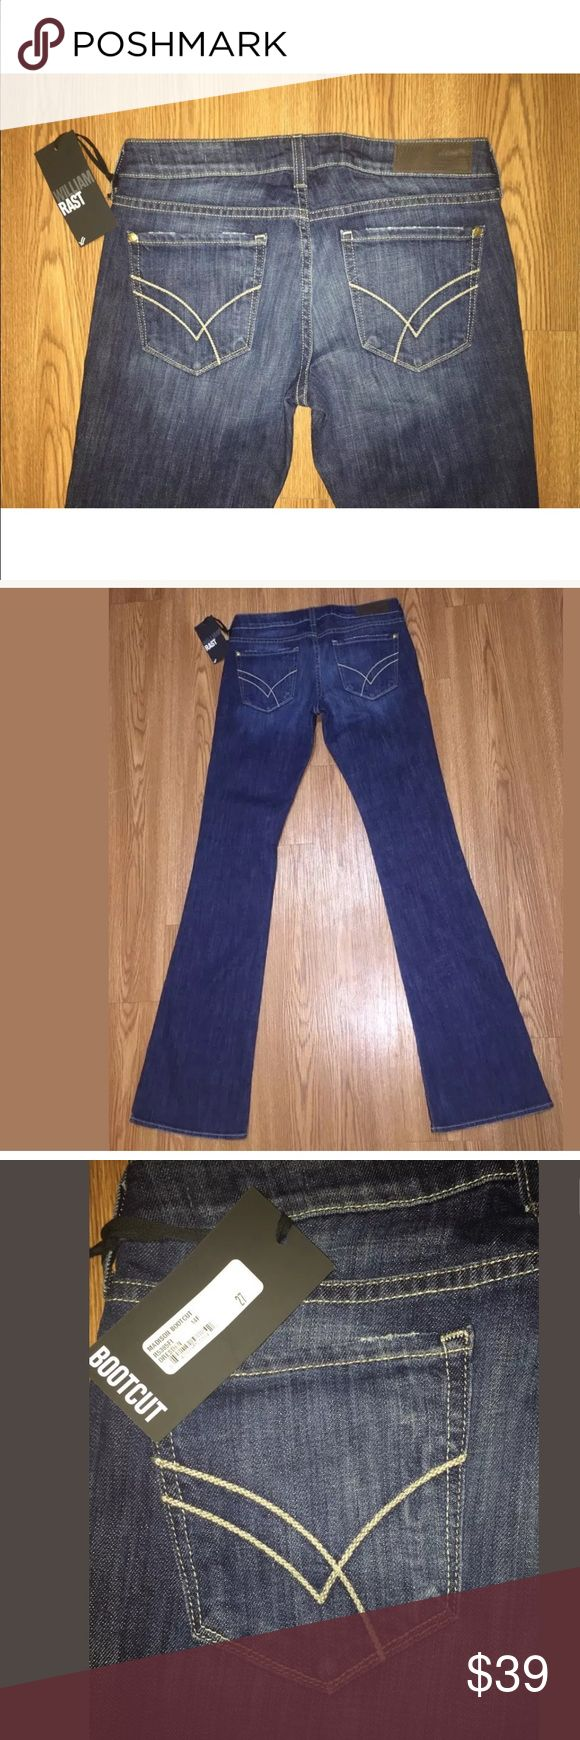 Vintage New William Rast Jeans X Madison Bootcut NWT